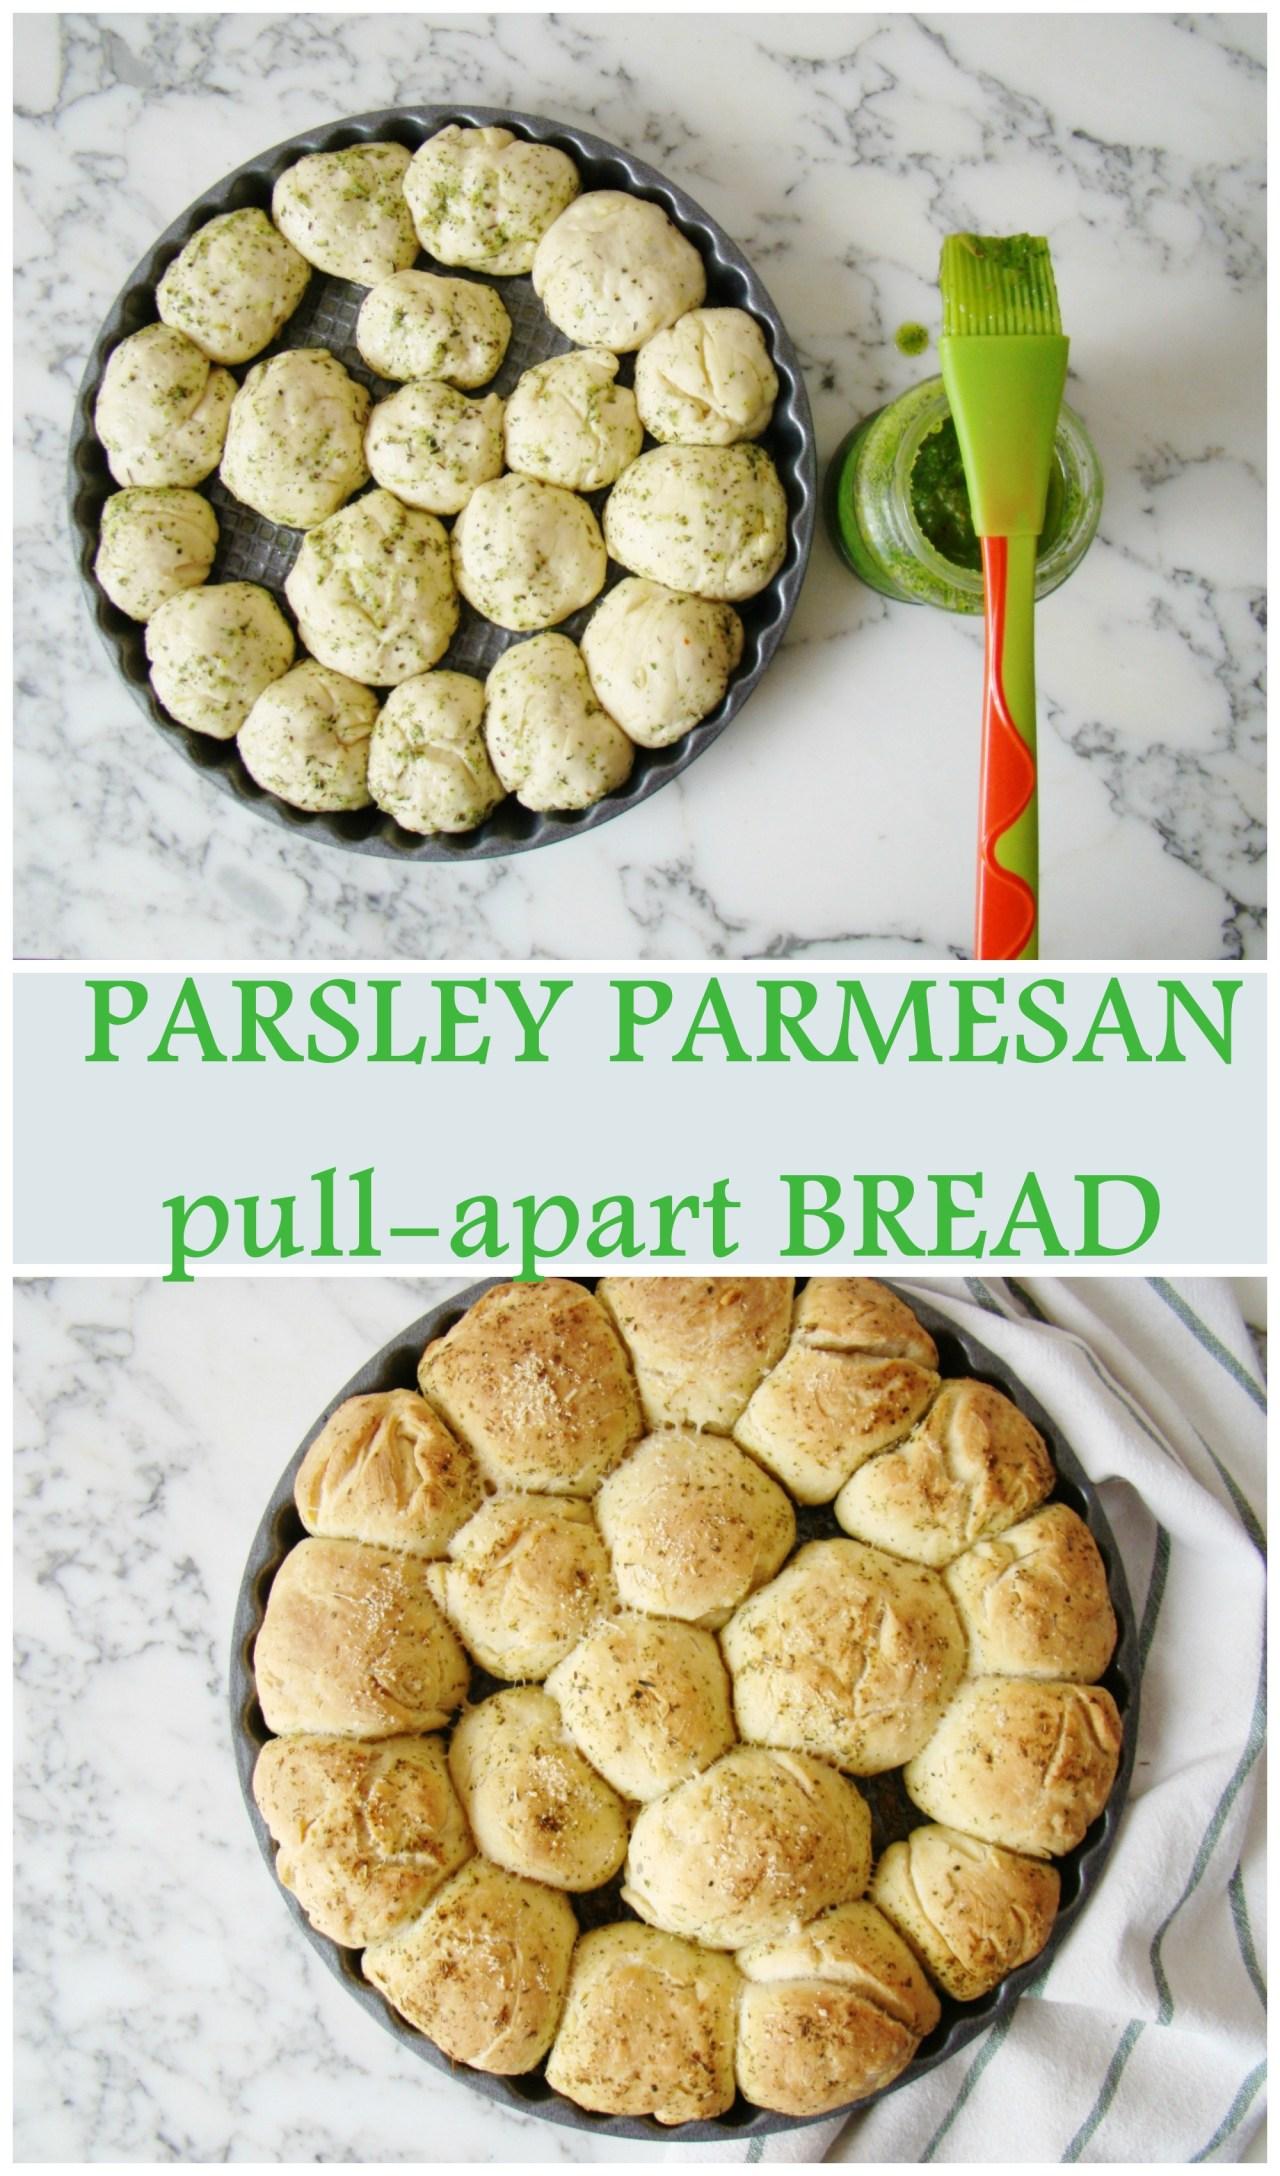 Parsley Parmesan pull-apart Bread